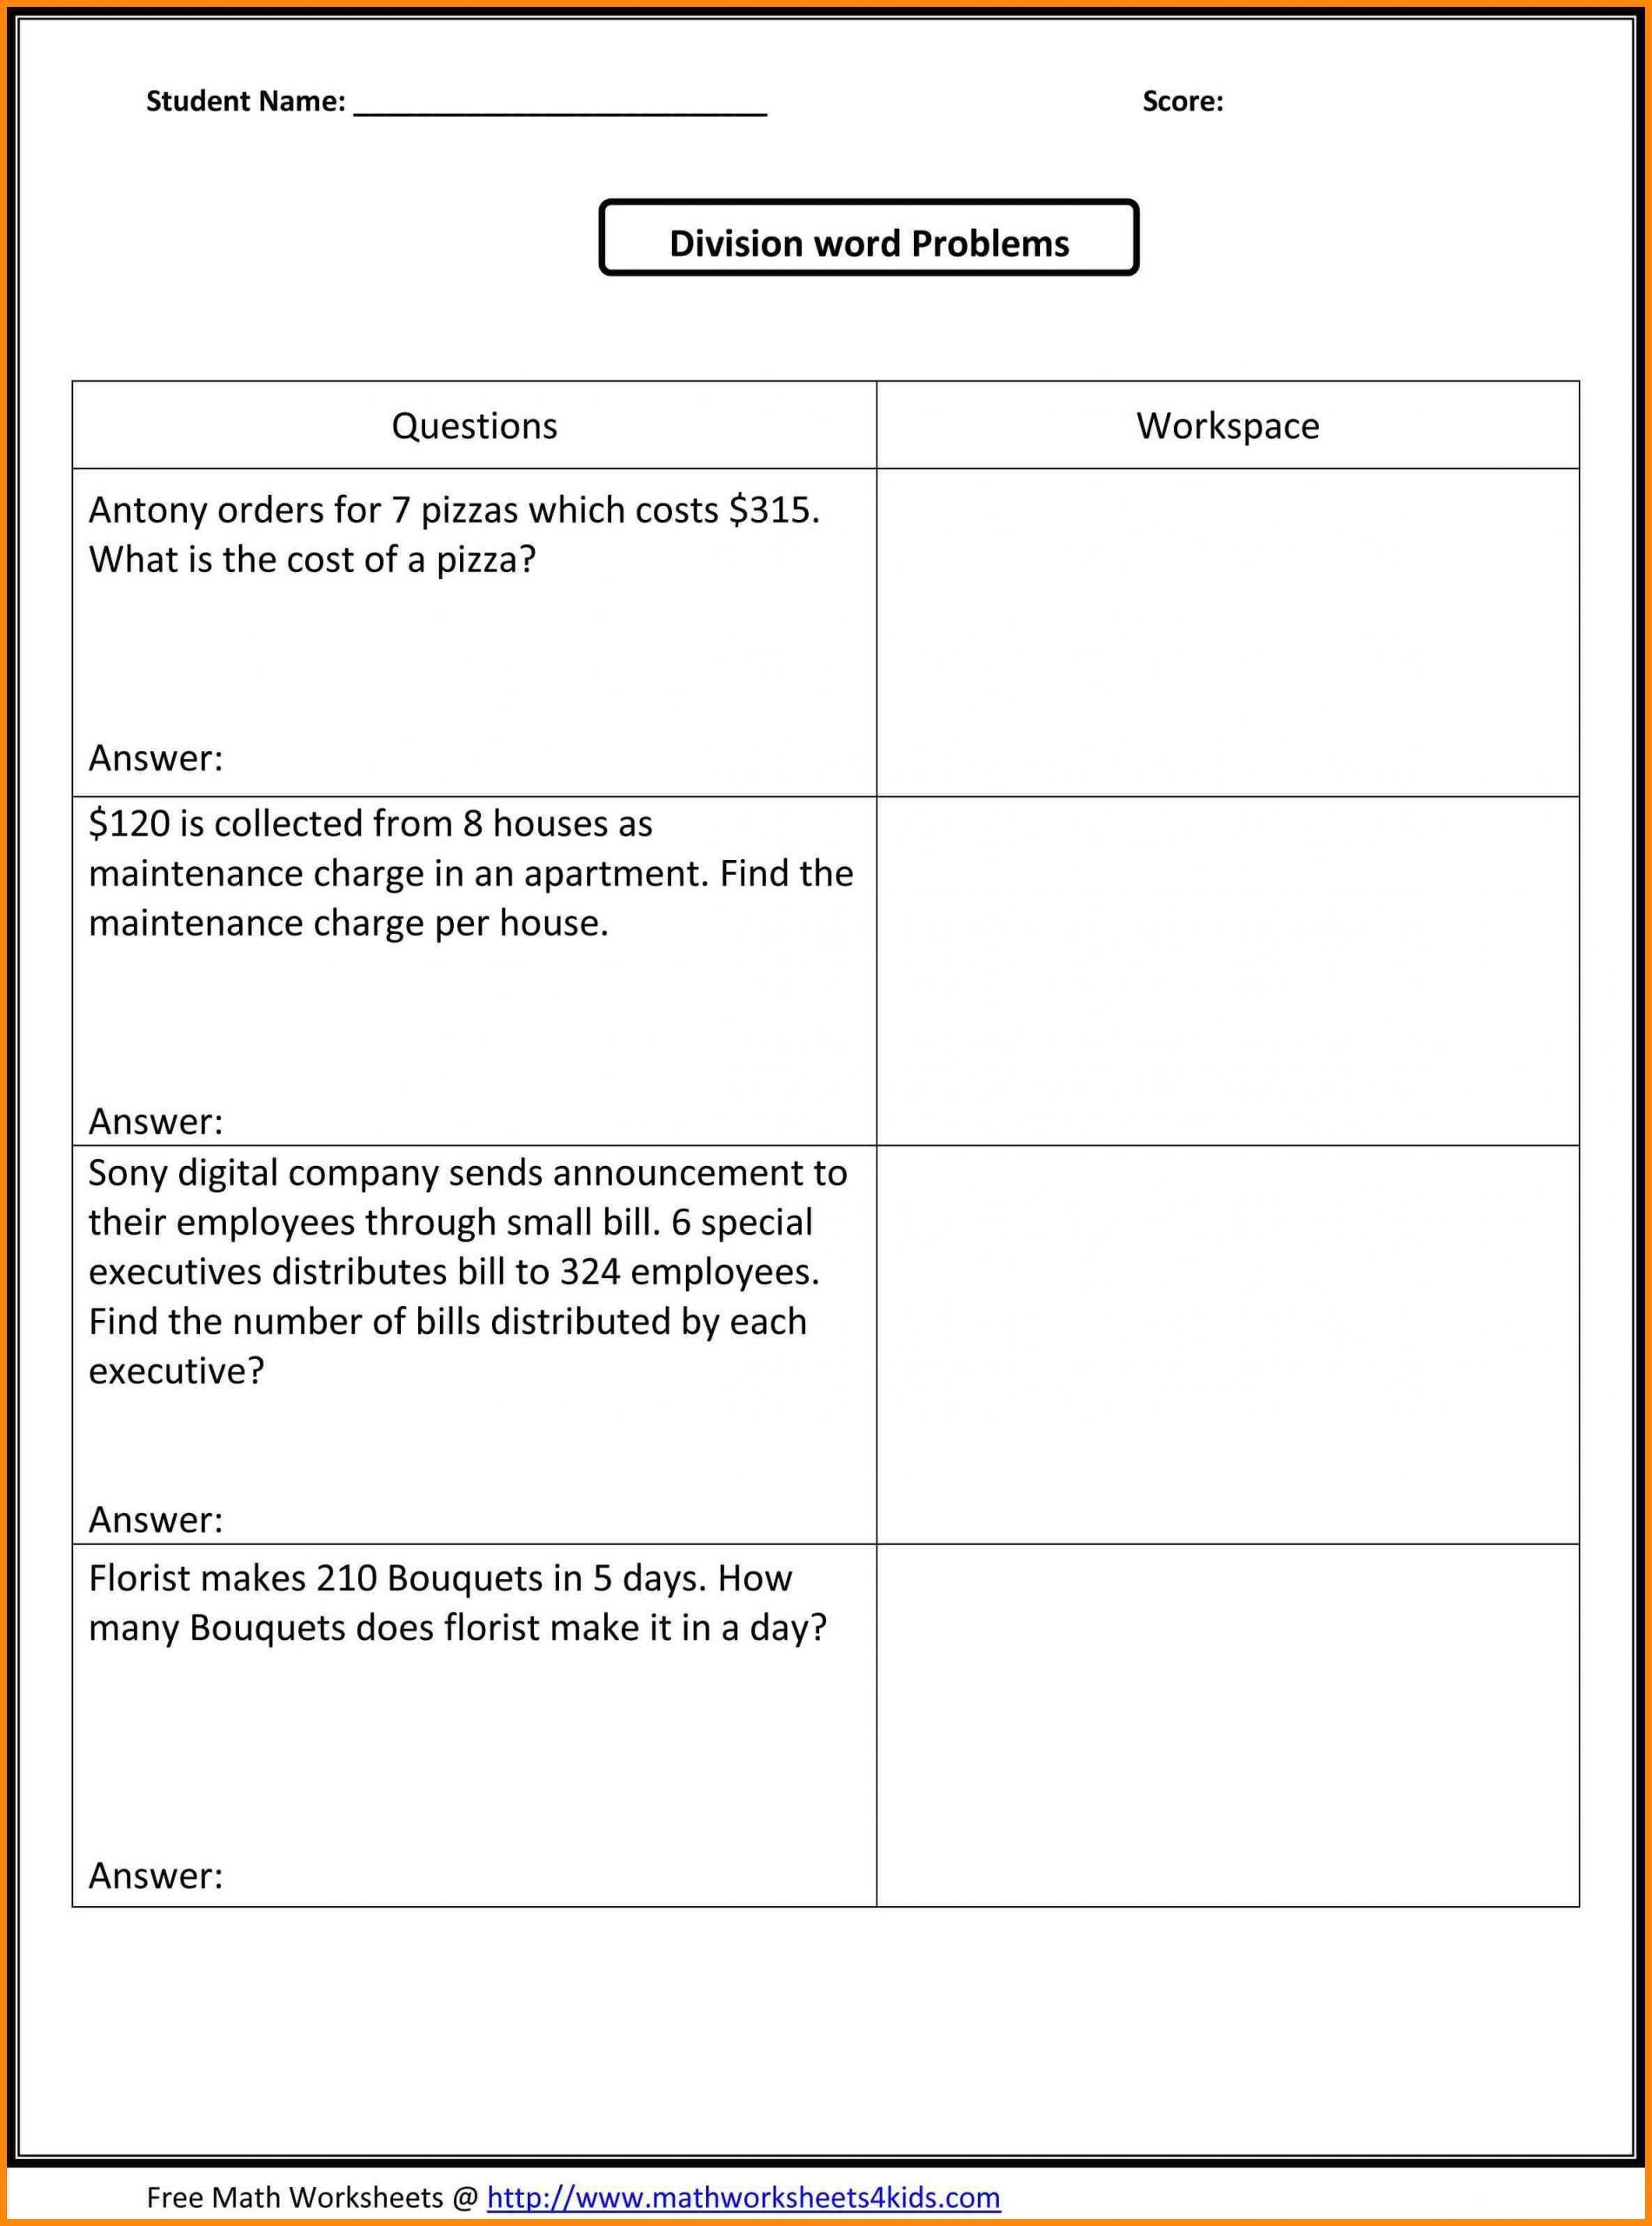 Distributive Property Worksheet 6th Grade Word Problem Worksheets Fraction Word Problems Free Math Worksheets